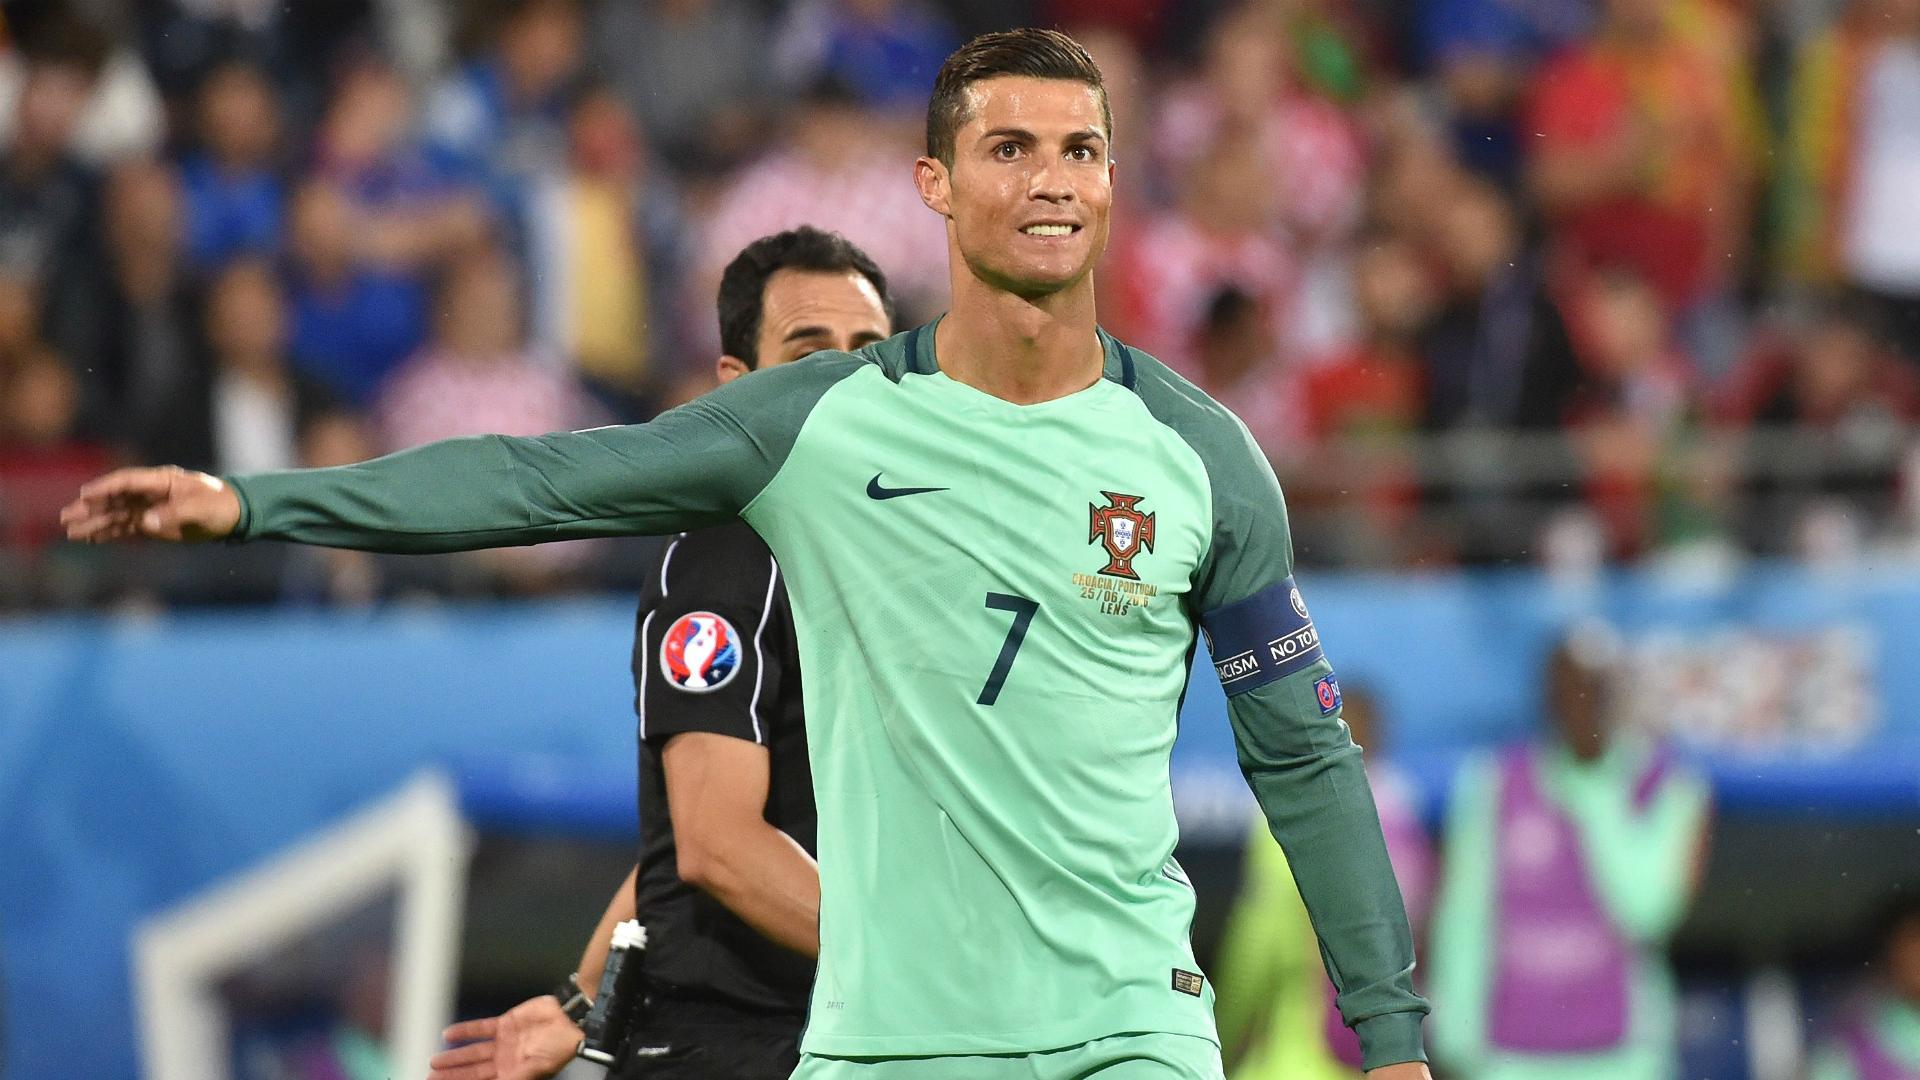 Gokil 53+ Gambar Ronaldo Portugal Euro 2016